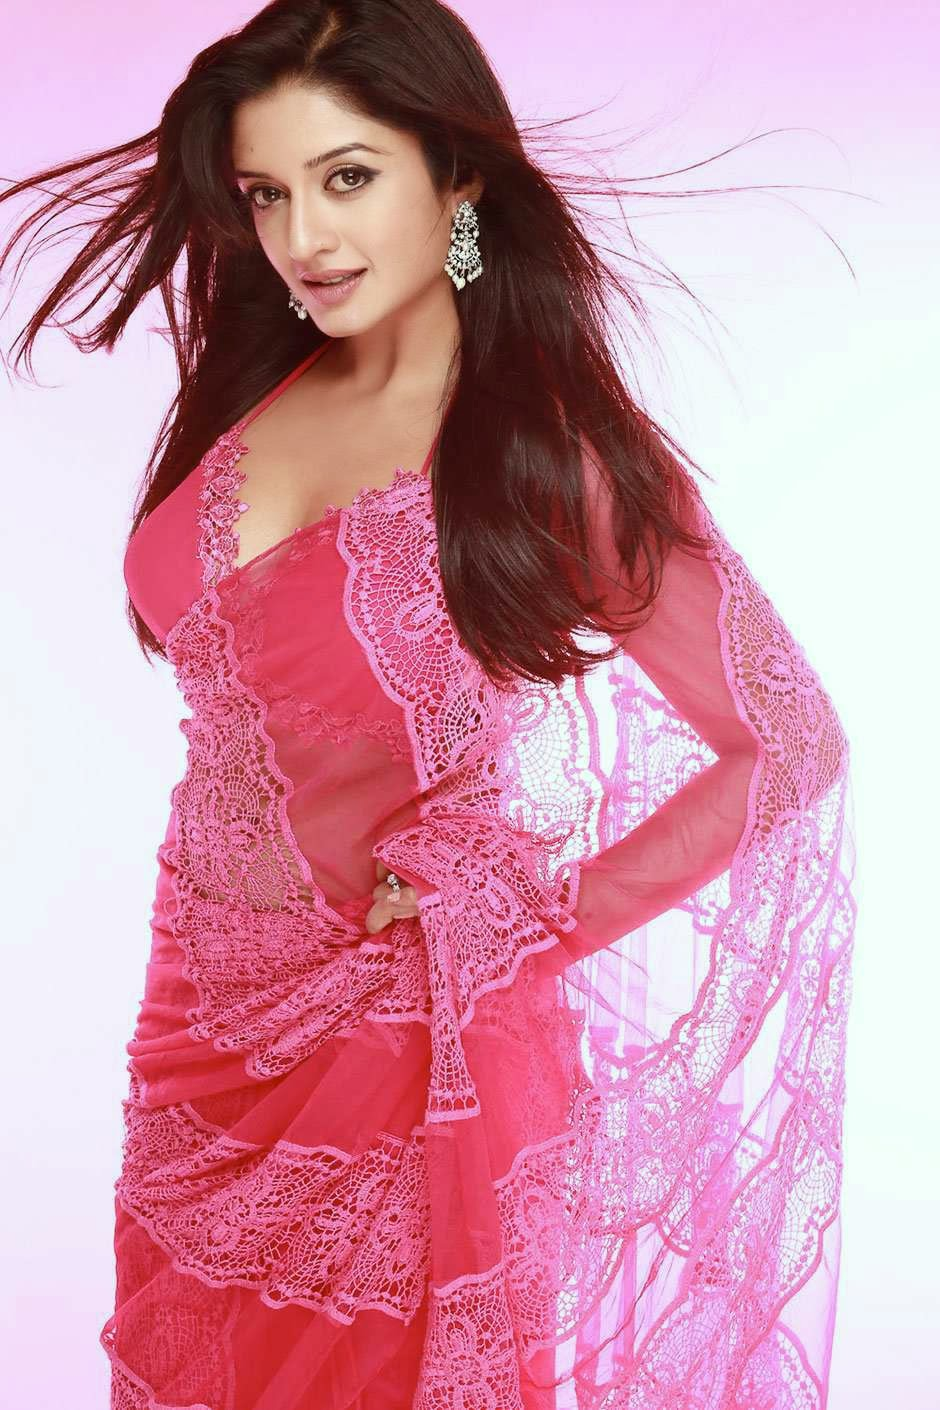 Vimala Raman Sexy Images & Photo Gallery